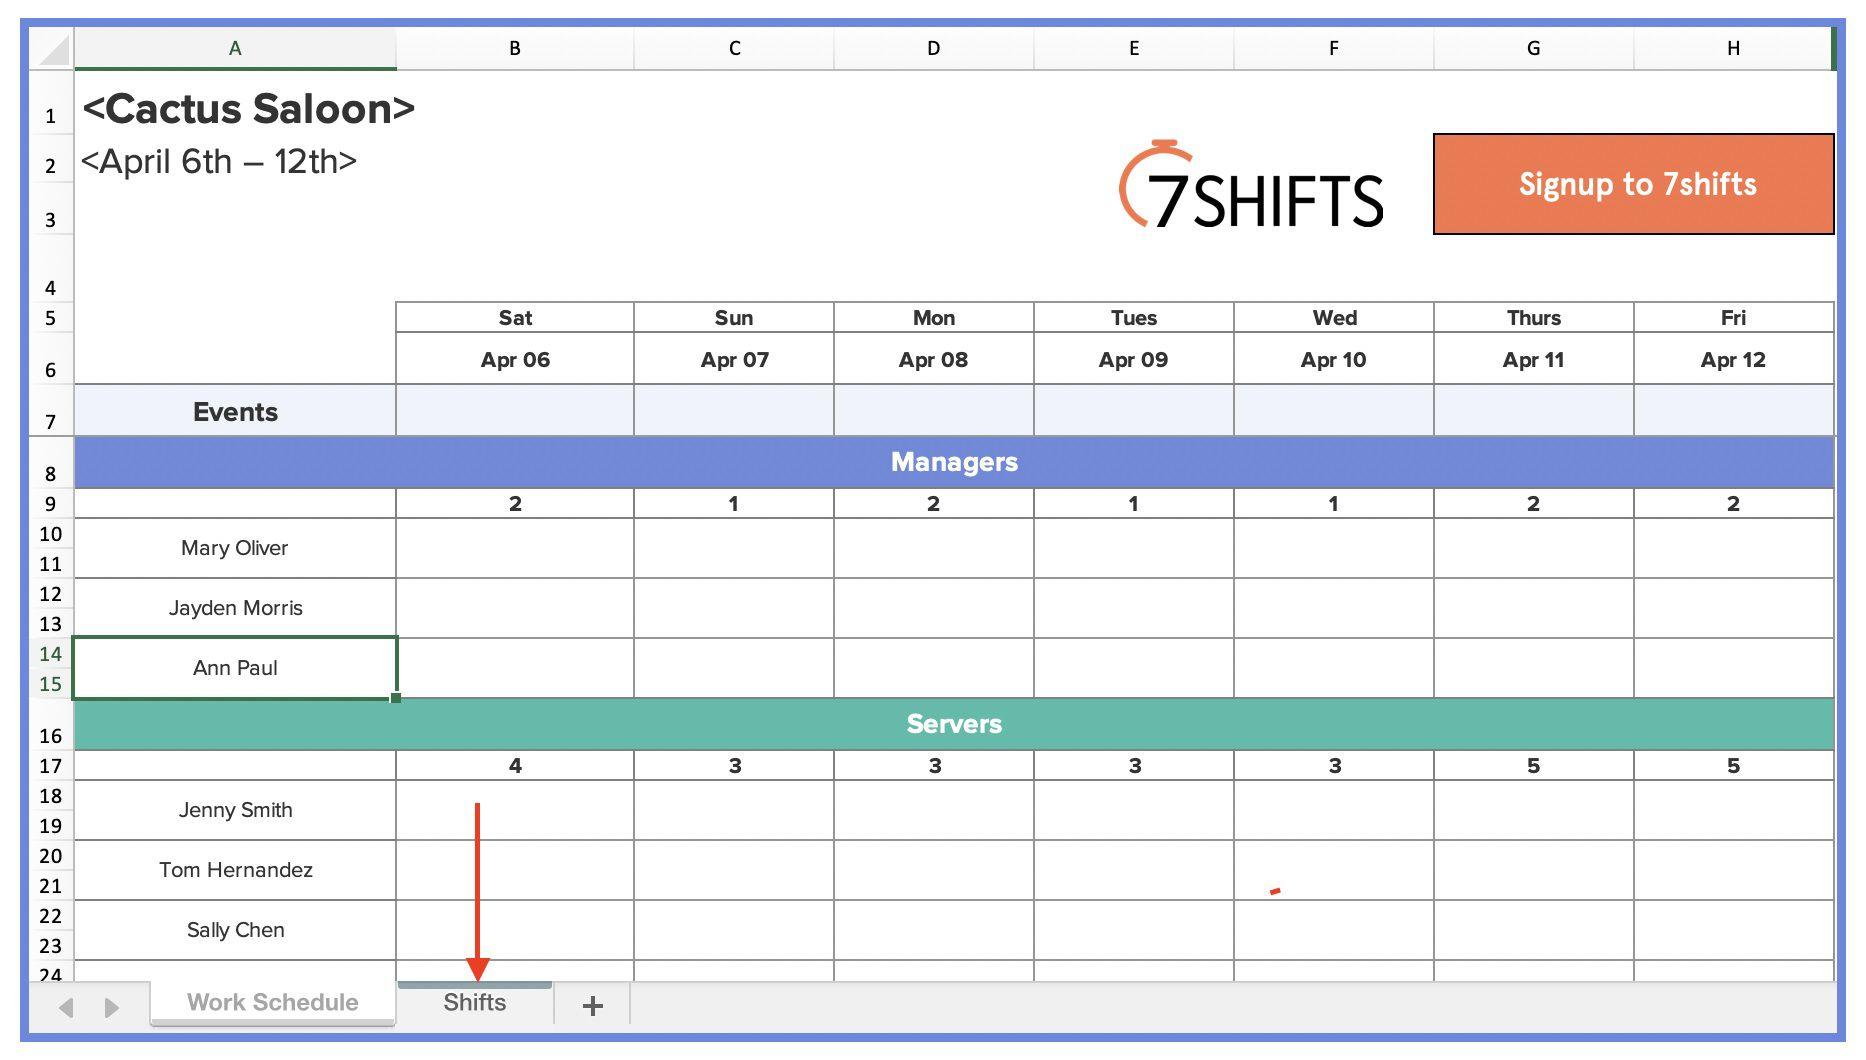 004 Striking Employee Shift Scheduling Template Photo  Schedule Google Sheet Work Plan Word Weekly Excel FreeFull